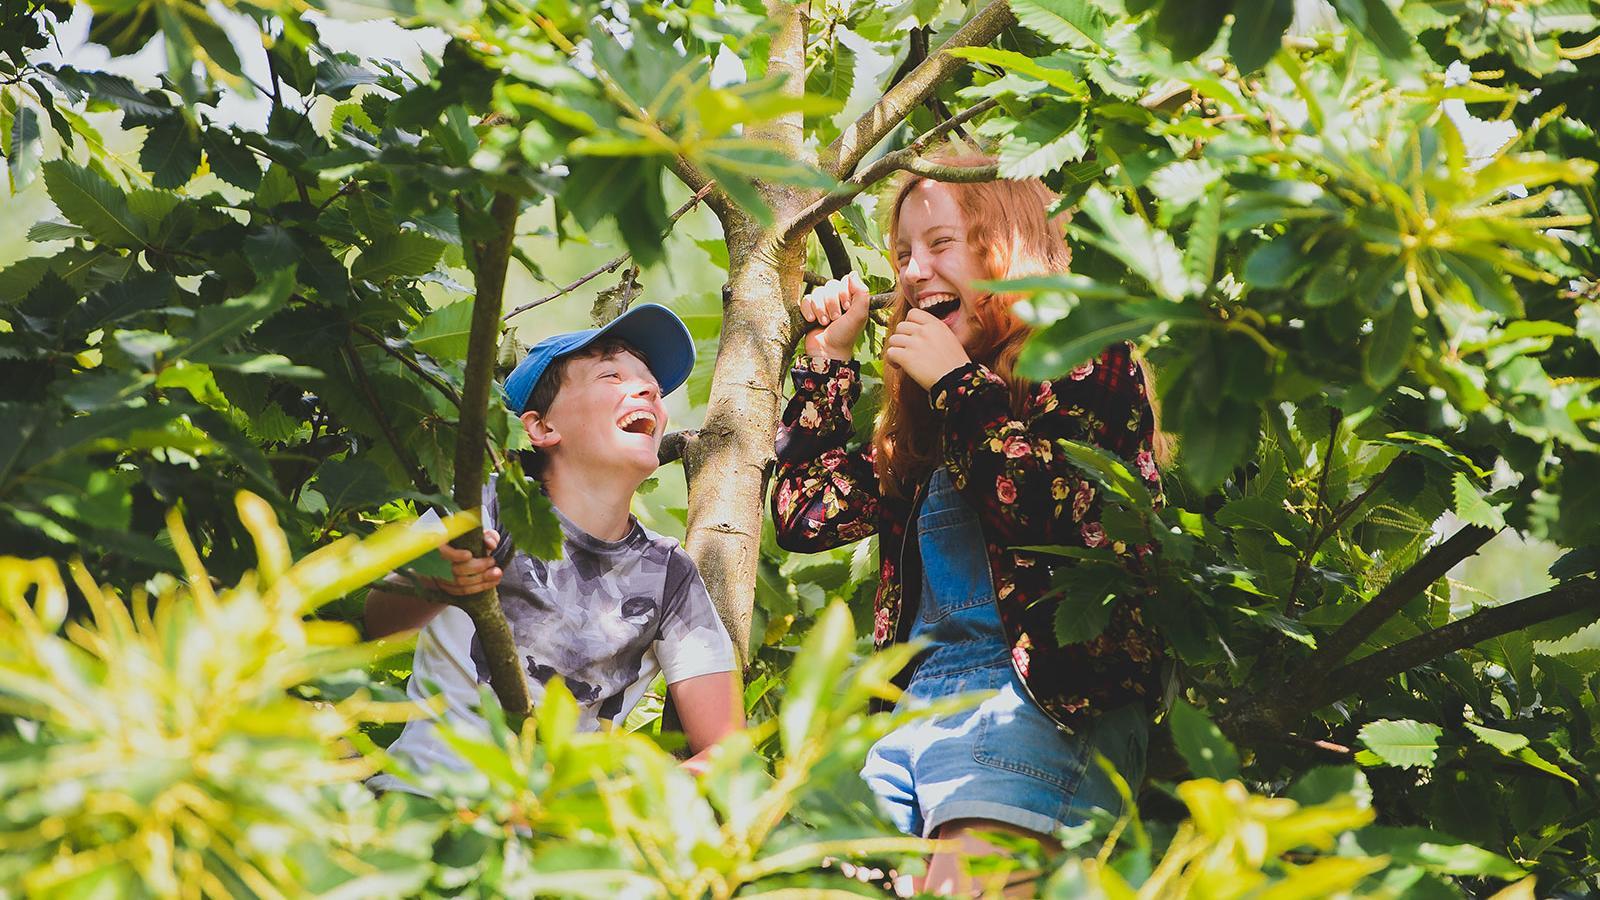 Dunhurst pupils tree climbing